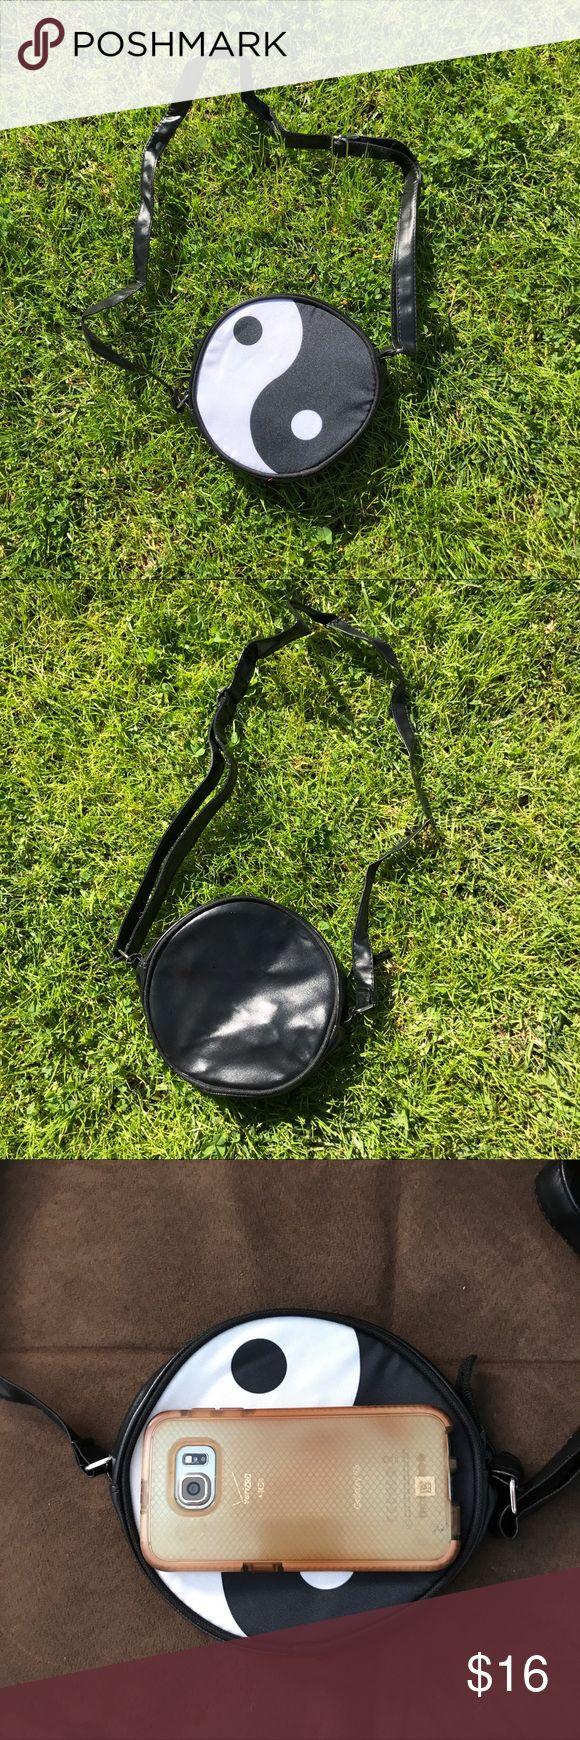 Yin Yang Circle Peace Bag Brand new, tags in original packaging. Yin Yang Peace Bag. Shoulder strap is adjustable to be longer.  Tags: festival, Coachella, beyond wonderland, lightning in a bottle, lib, rave, ravewear, dollskill, skinnydip, UNIF, harajuku, kawaii, Lolita, handbag, crossbody, topshop Bags Crossbody Bags